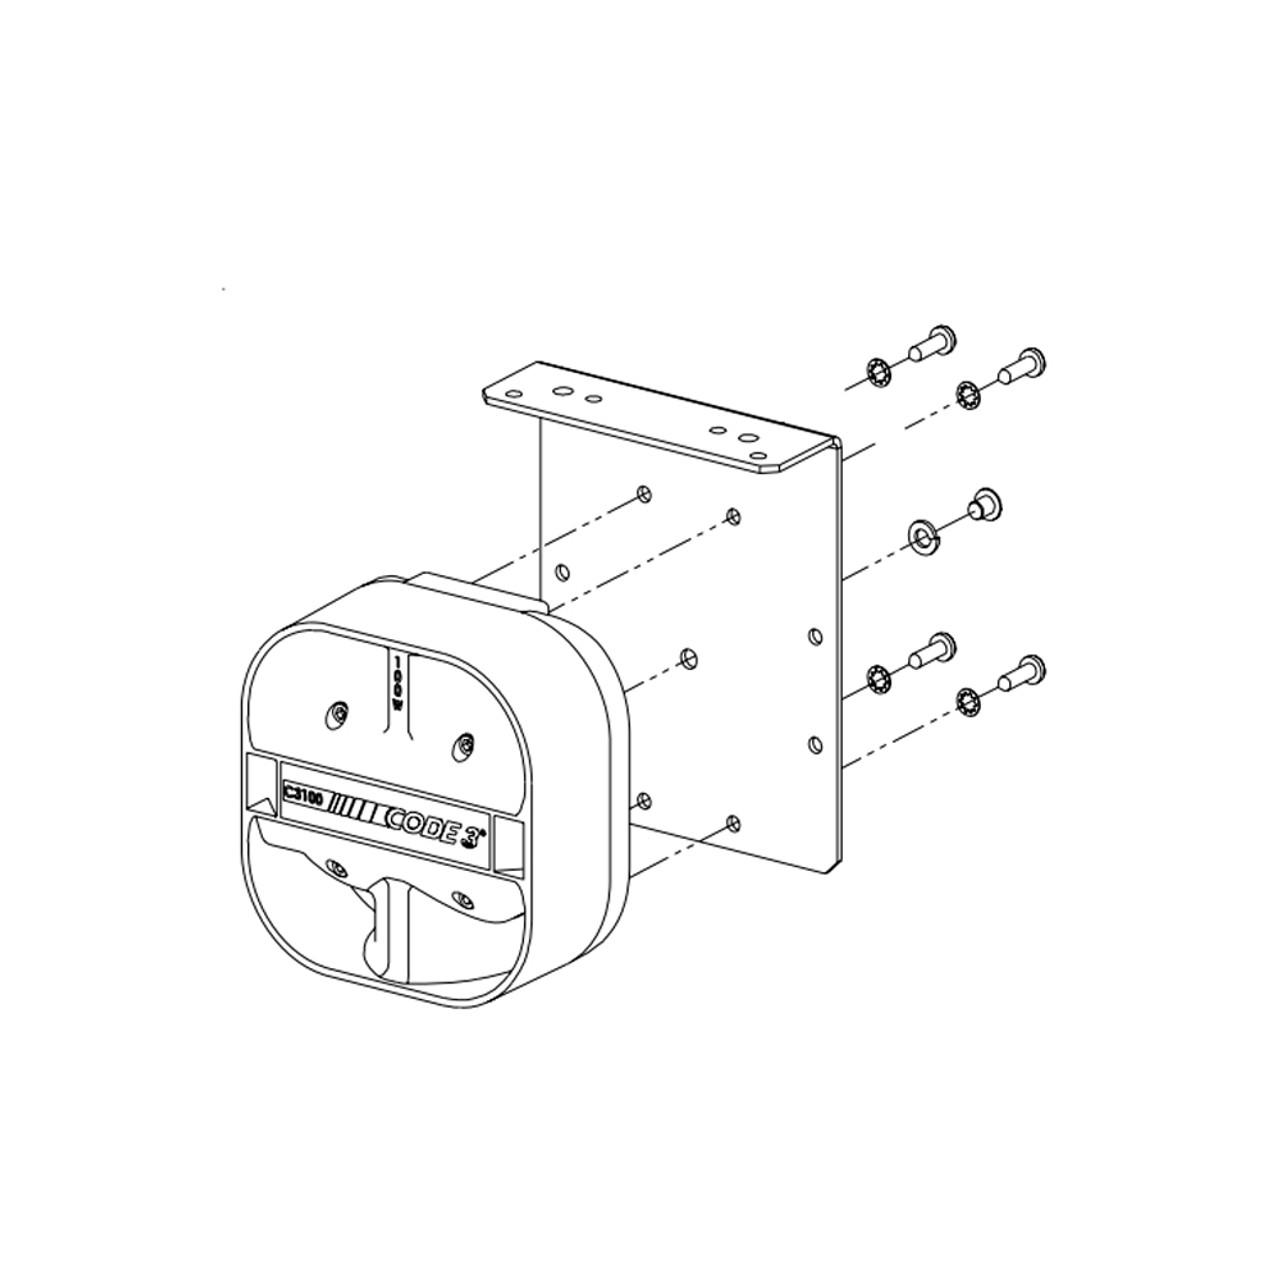 code 3 c3100 100 watt speaker 3-Way Switch Wiring Diagram